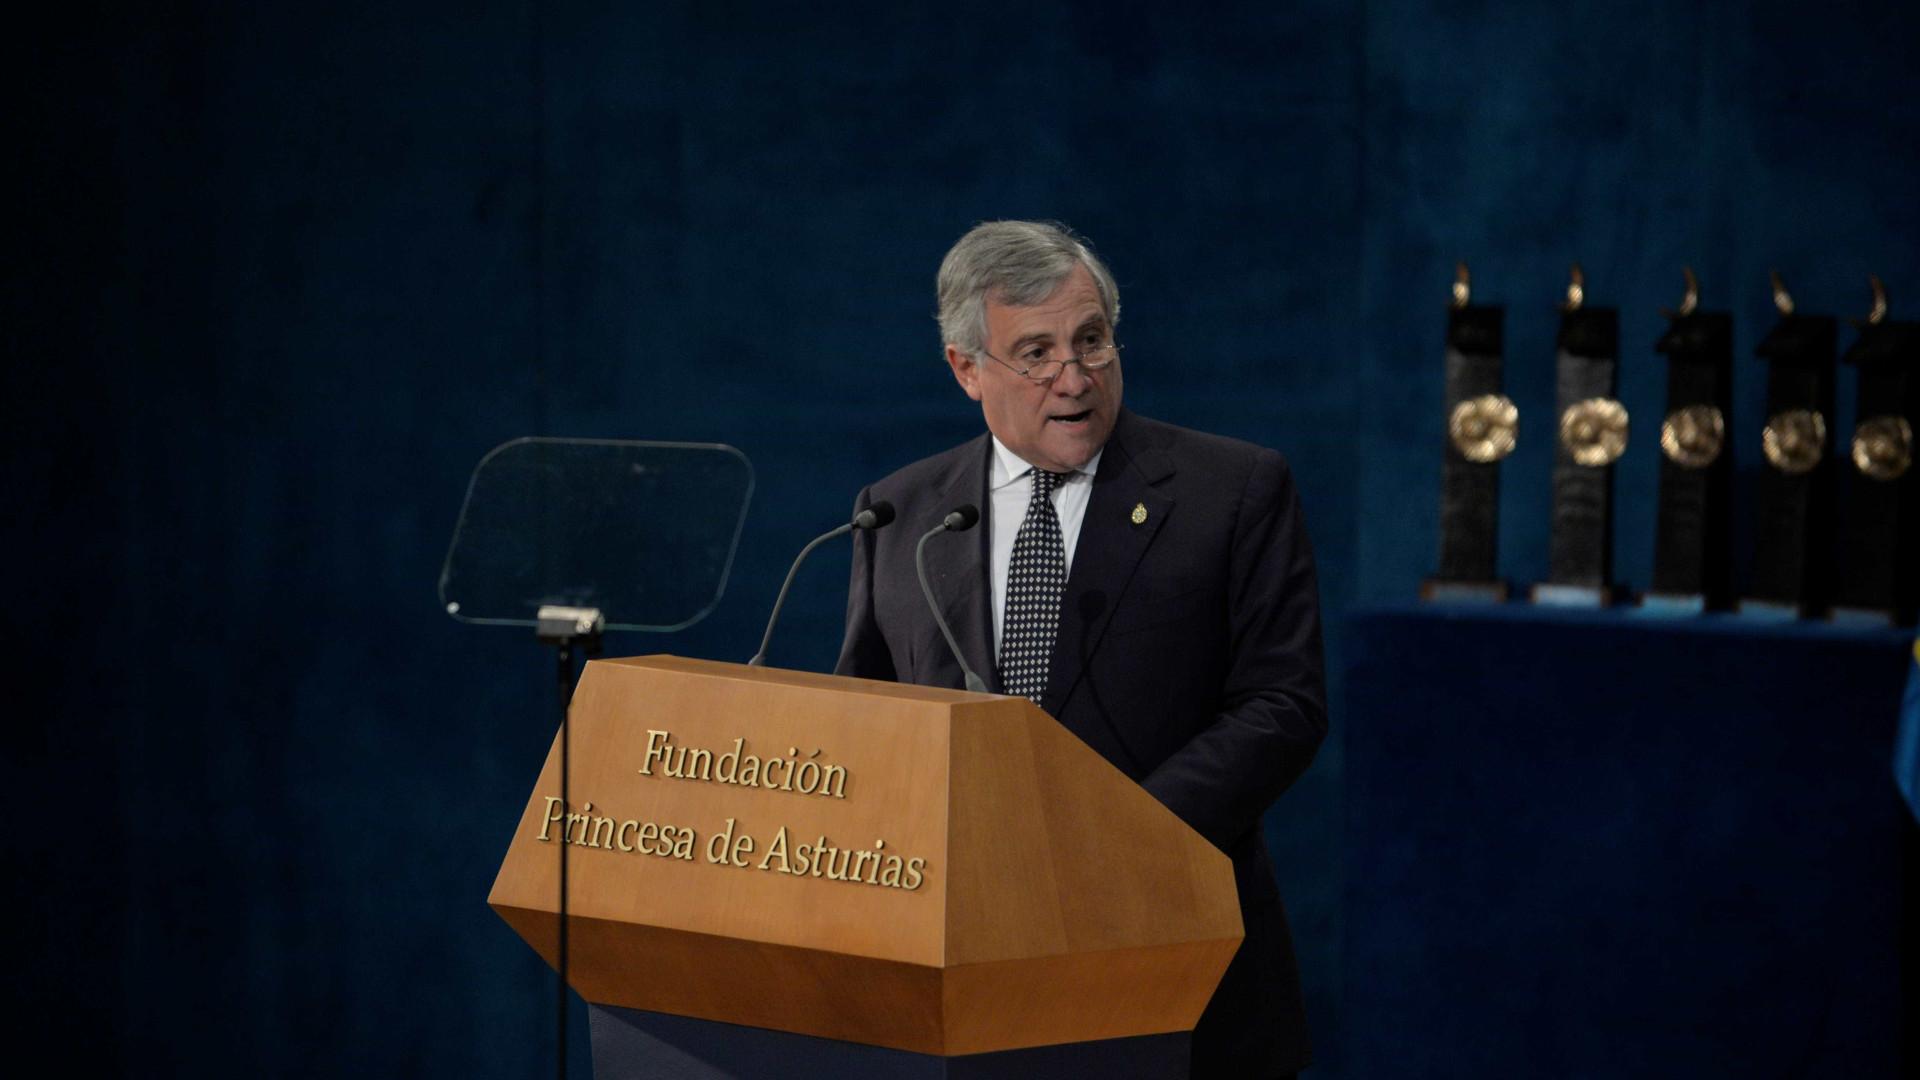 Tajani coloca-se ao lado de Costa na defesa de novos impostos europeus